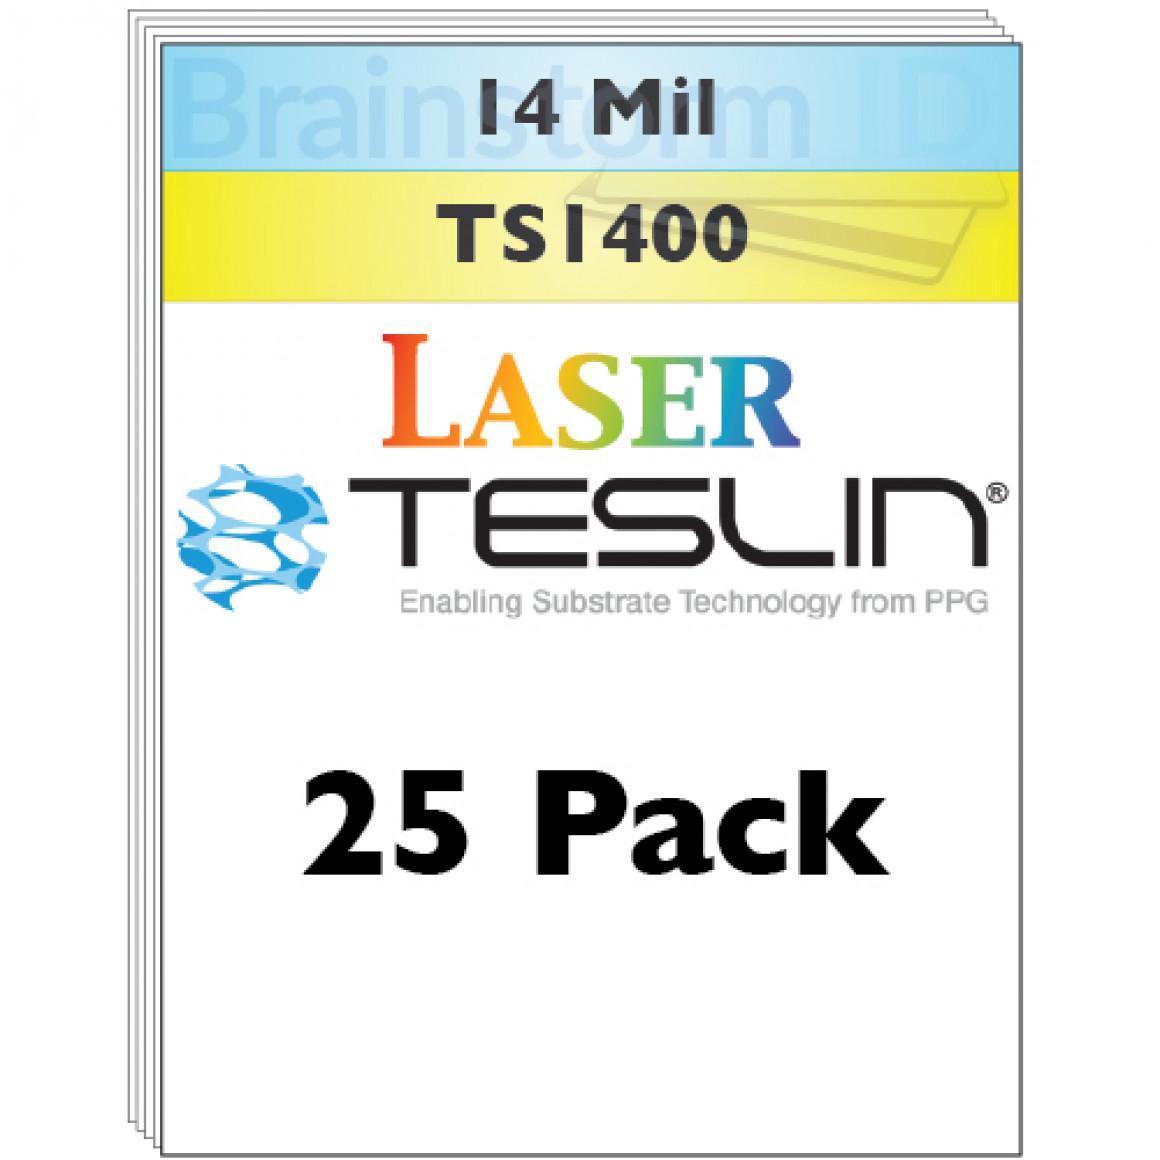 Teslin TS1400 (SP1400TS) - 14 Mil Laser Teslin - 25 Pack